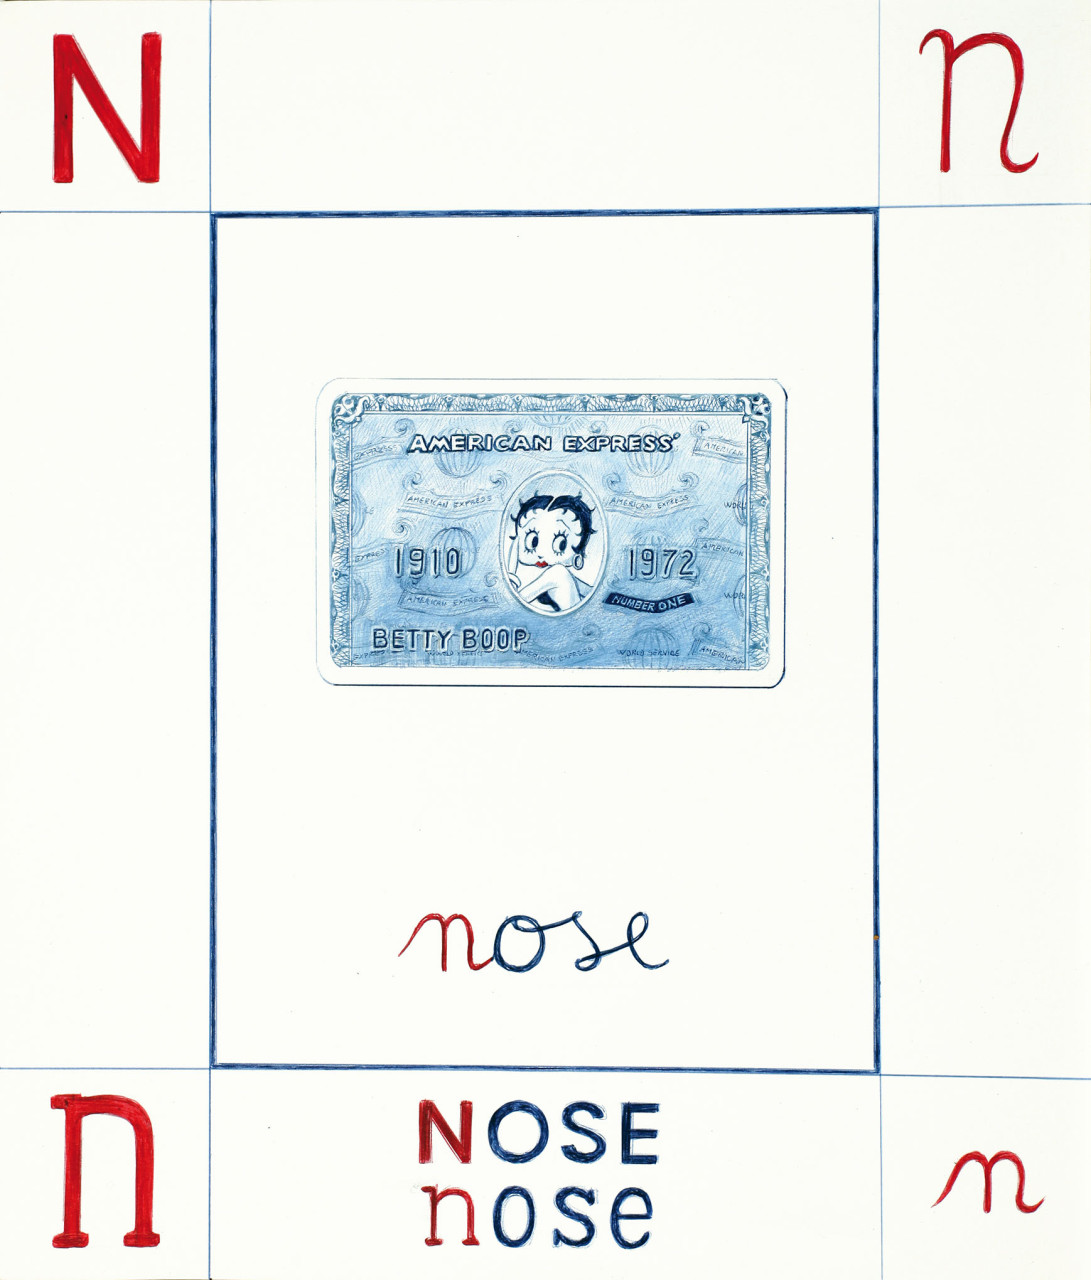 14N-nose_bassa